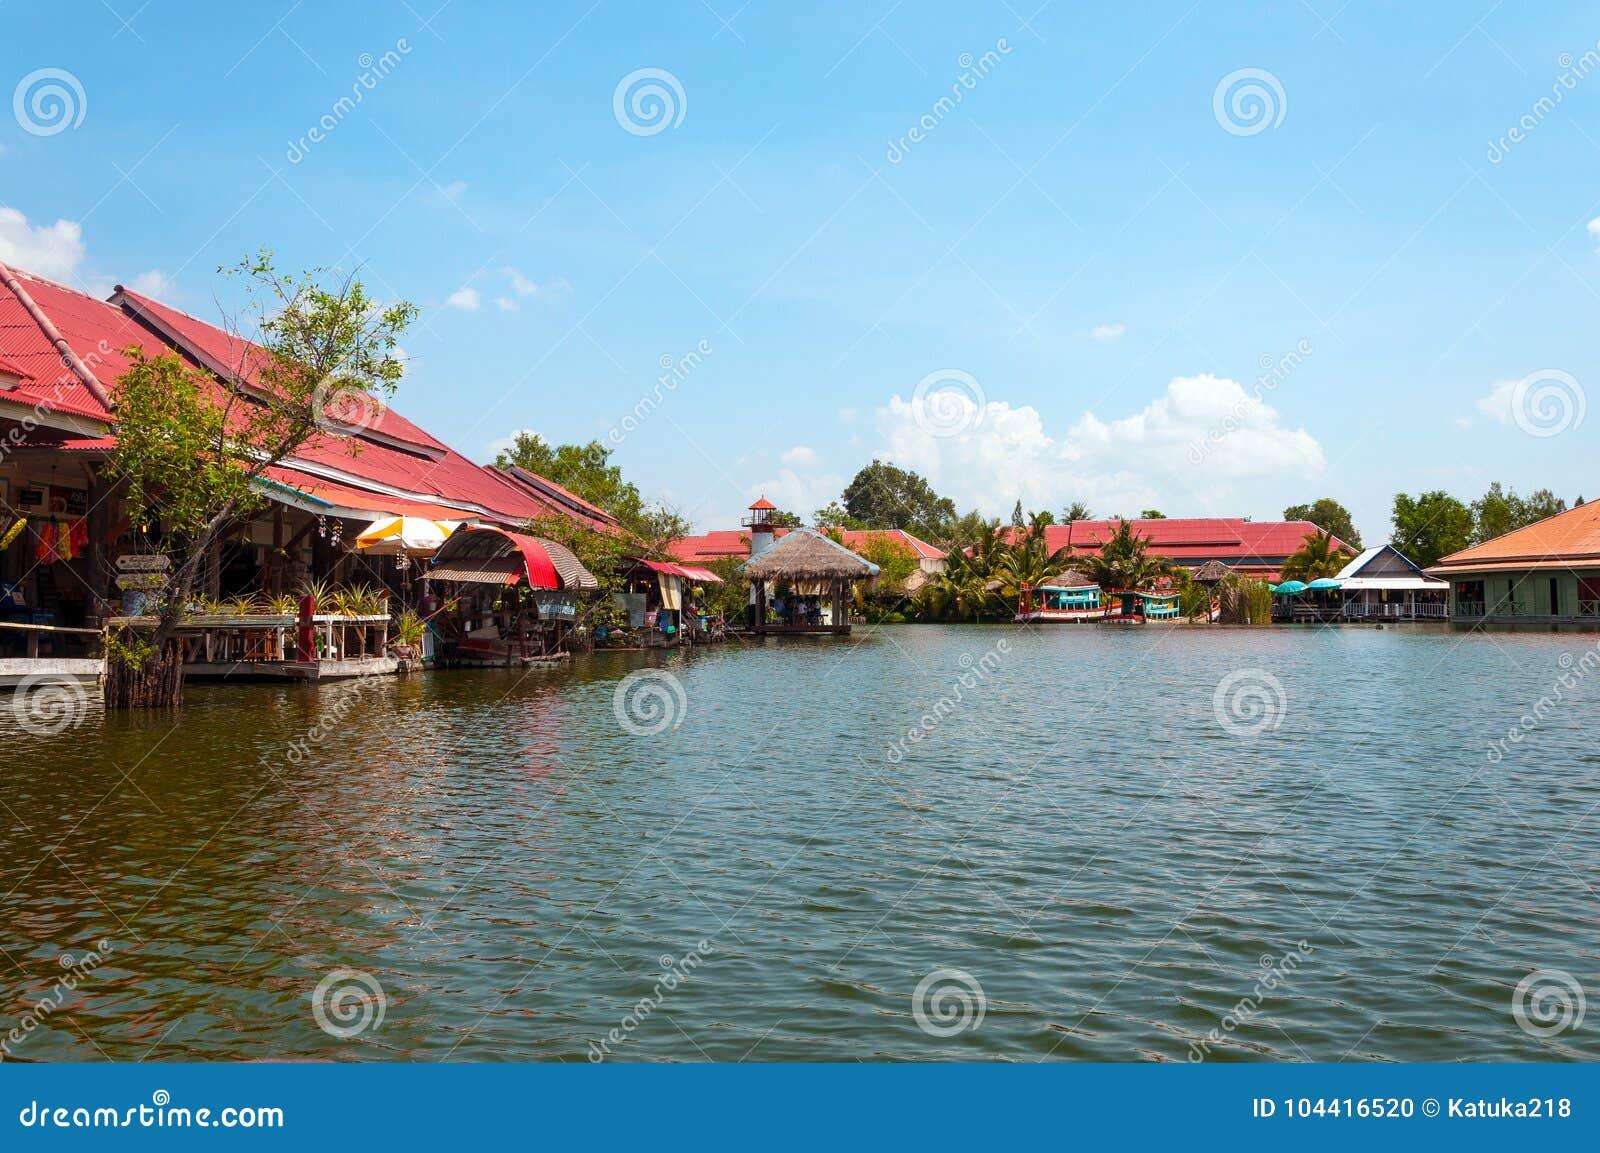 Hua Hin Floating Market in Hua Hin thailand